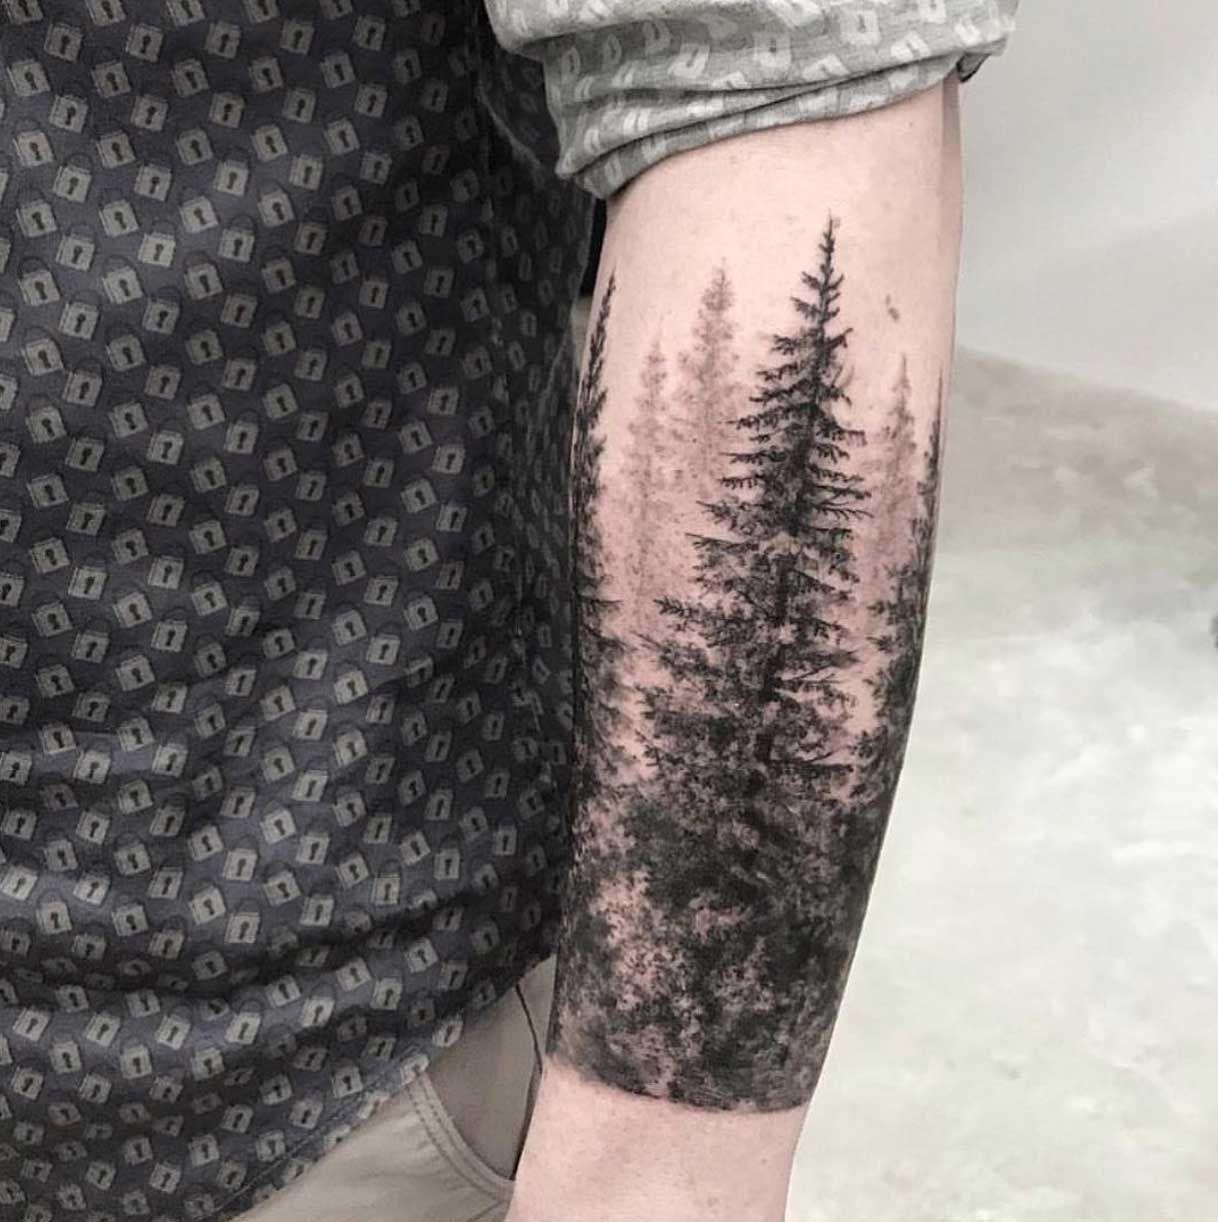 80 Faszinierende Armel Tattoos Fur Manner Und Frauen Seite 5 Von 8 Forearm Tree Tattoos Tattoos Meaningful Tattoos Dovme Fikirleri Dovme Dovmeli Kadin